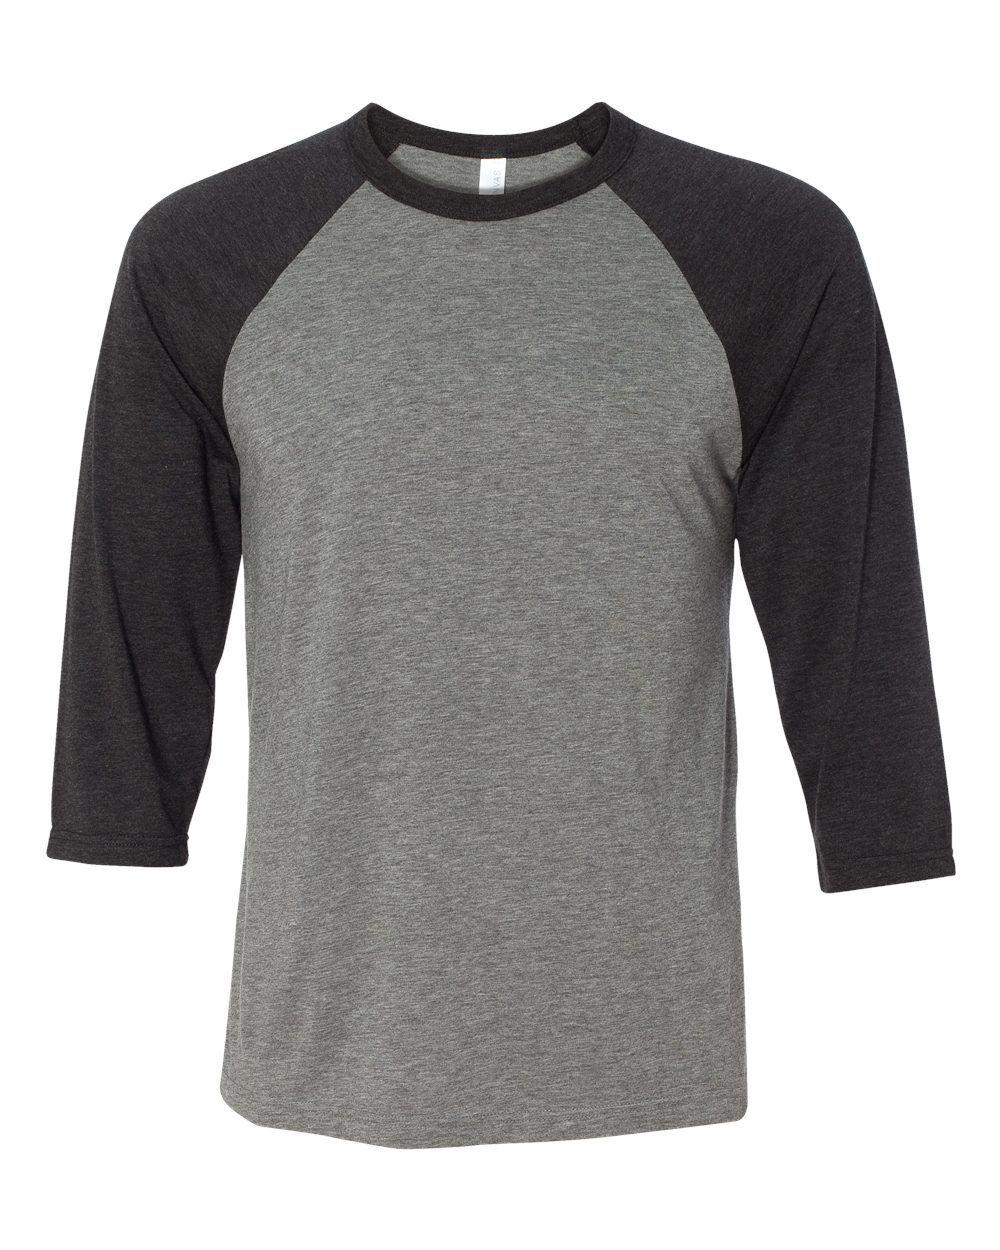 Canvas mens 3 4 sleeve baseball jersey t shirt raglan tee for Baseball jersey t shirt custom